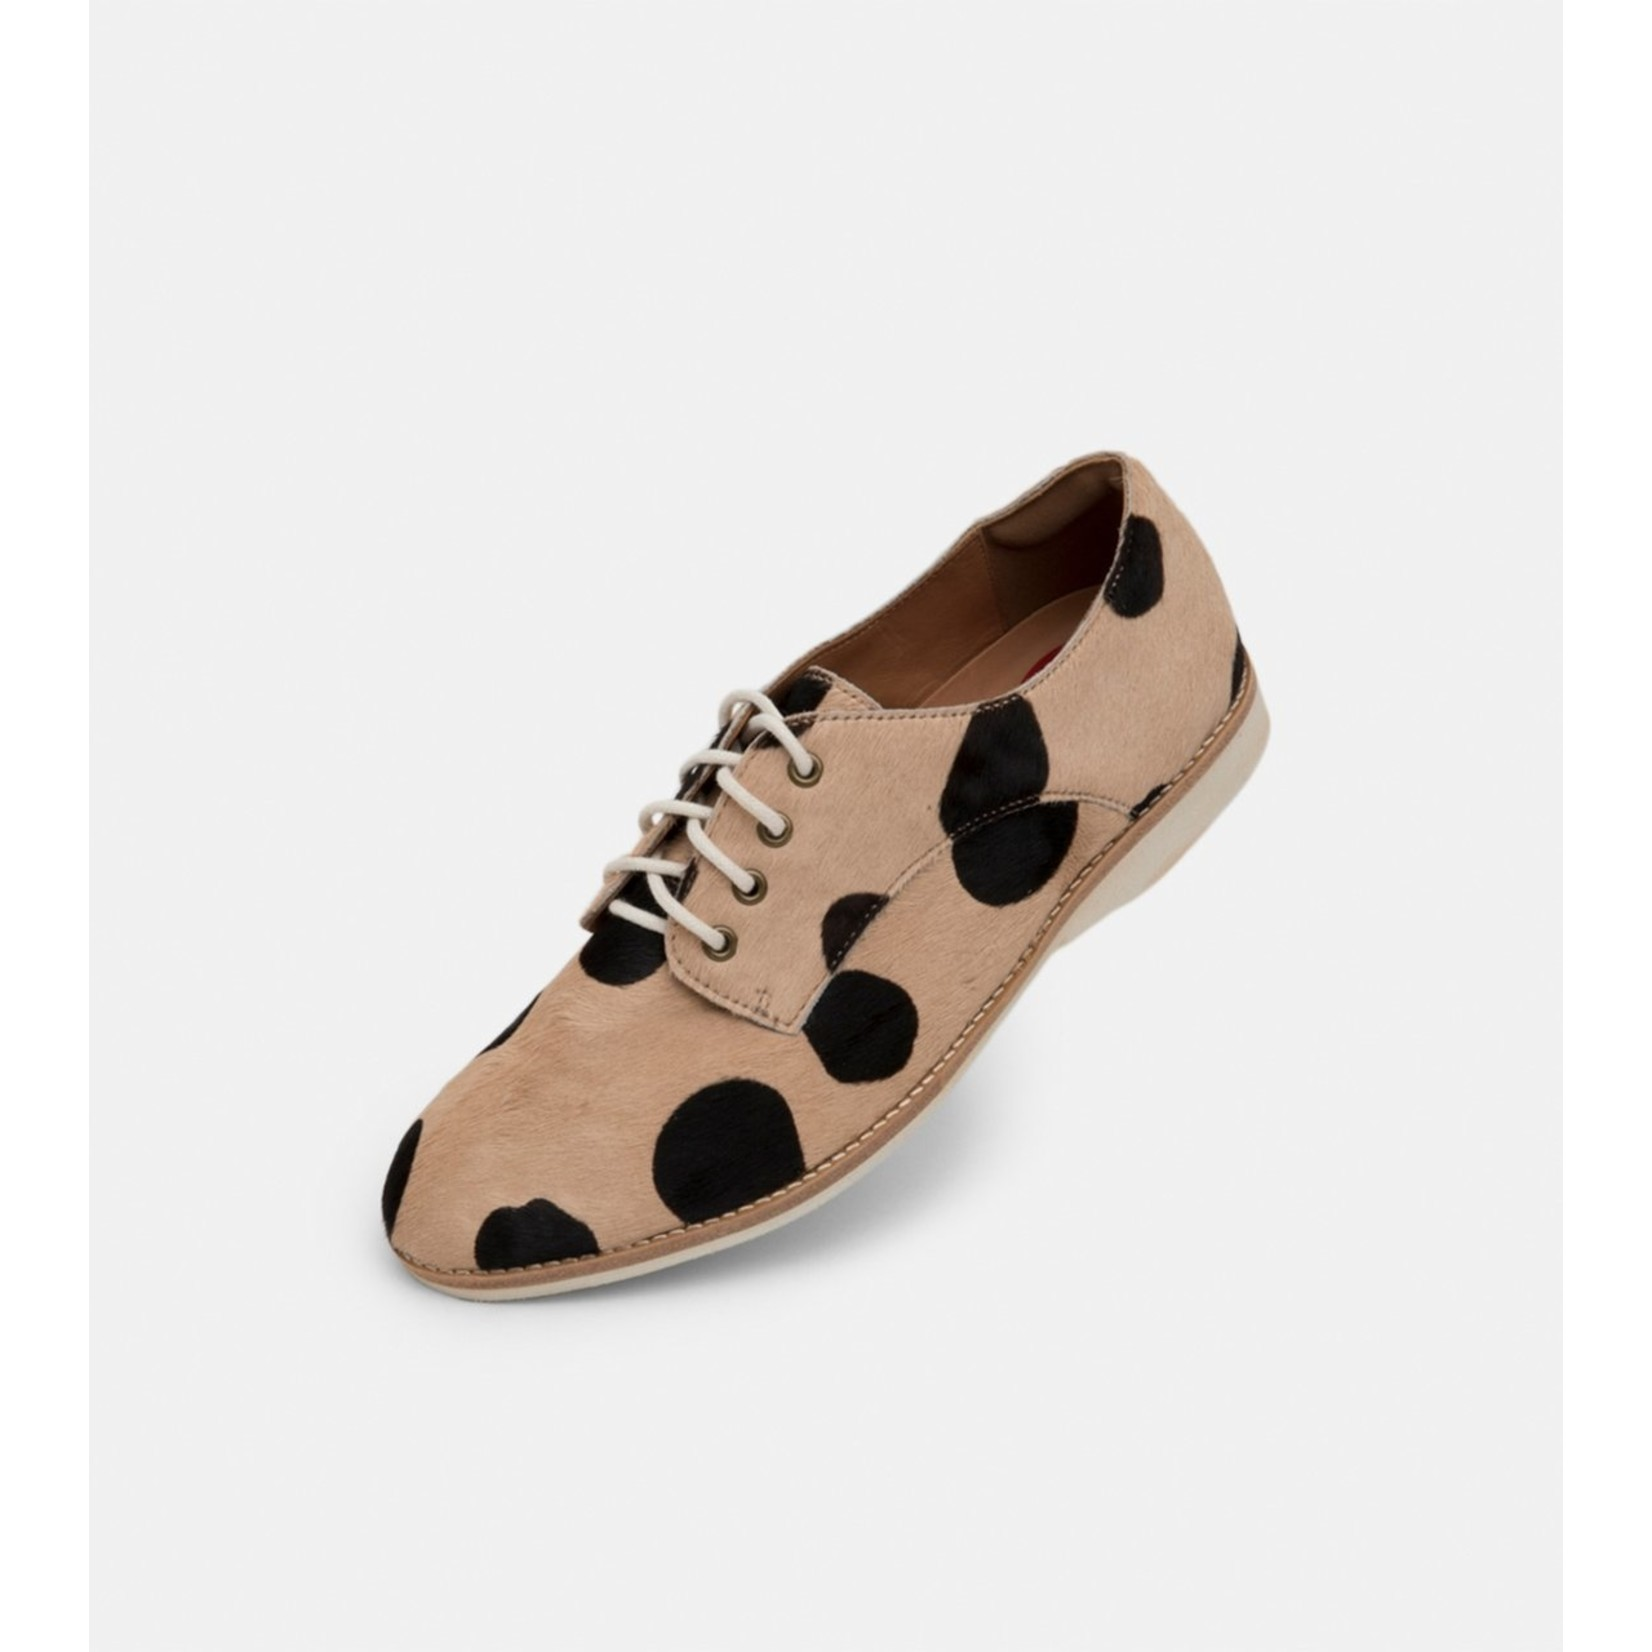 Rollie Derby Beige and Black Spots